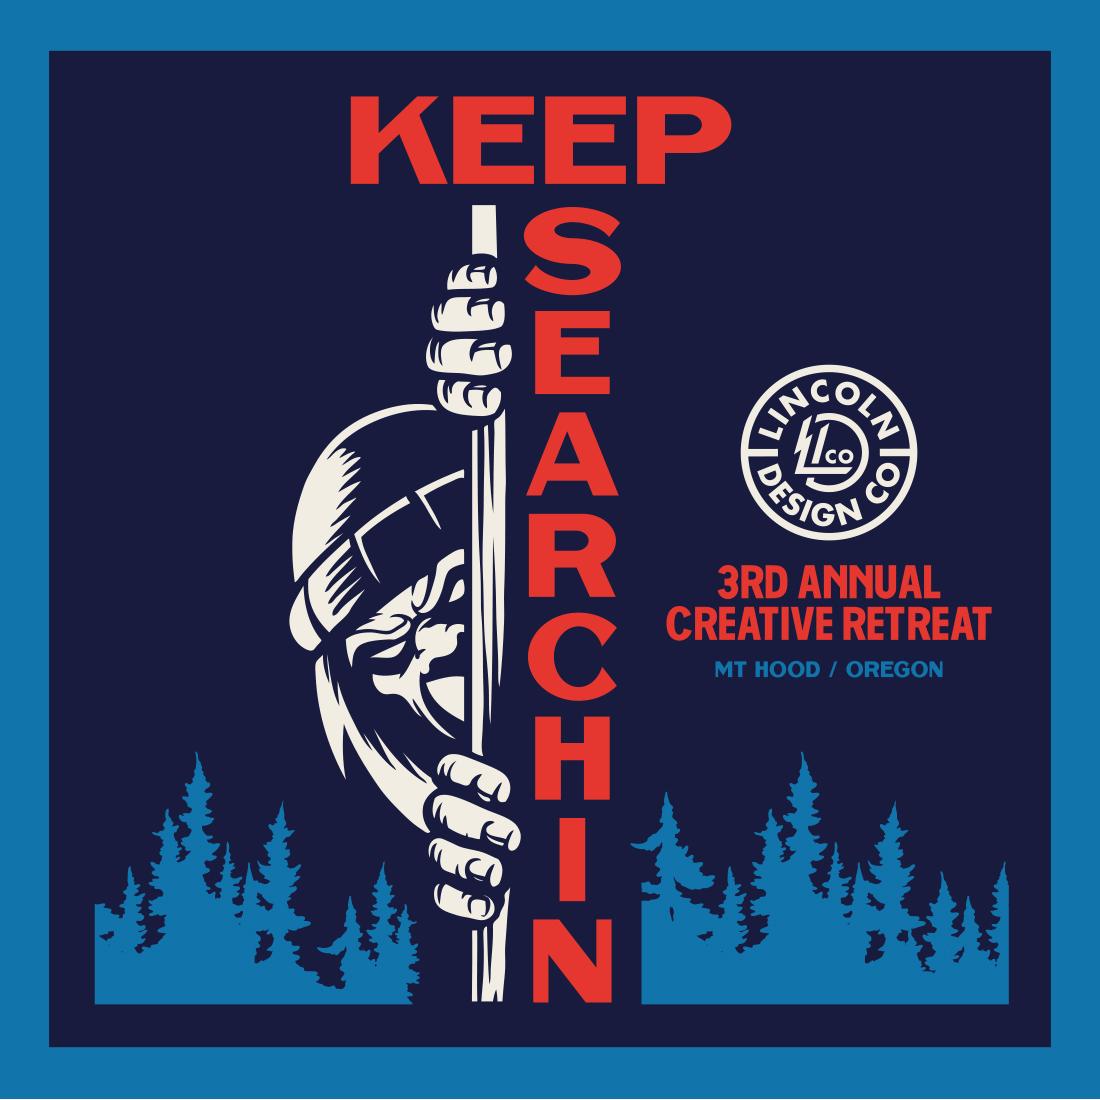 KeepSearchin_blog_1.jpg